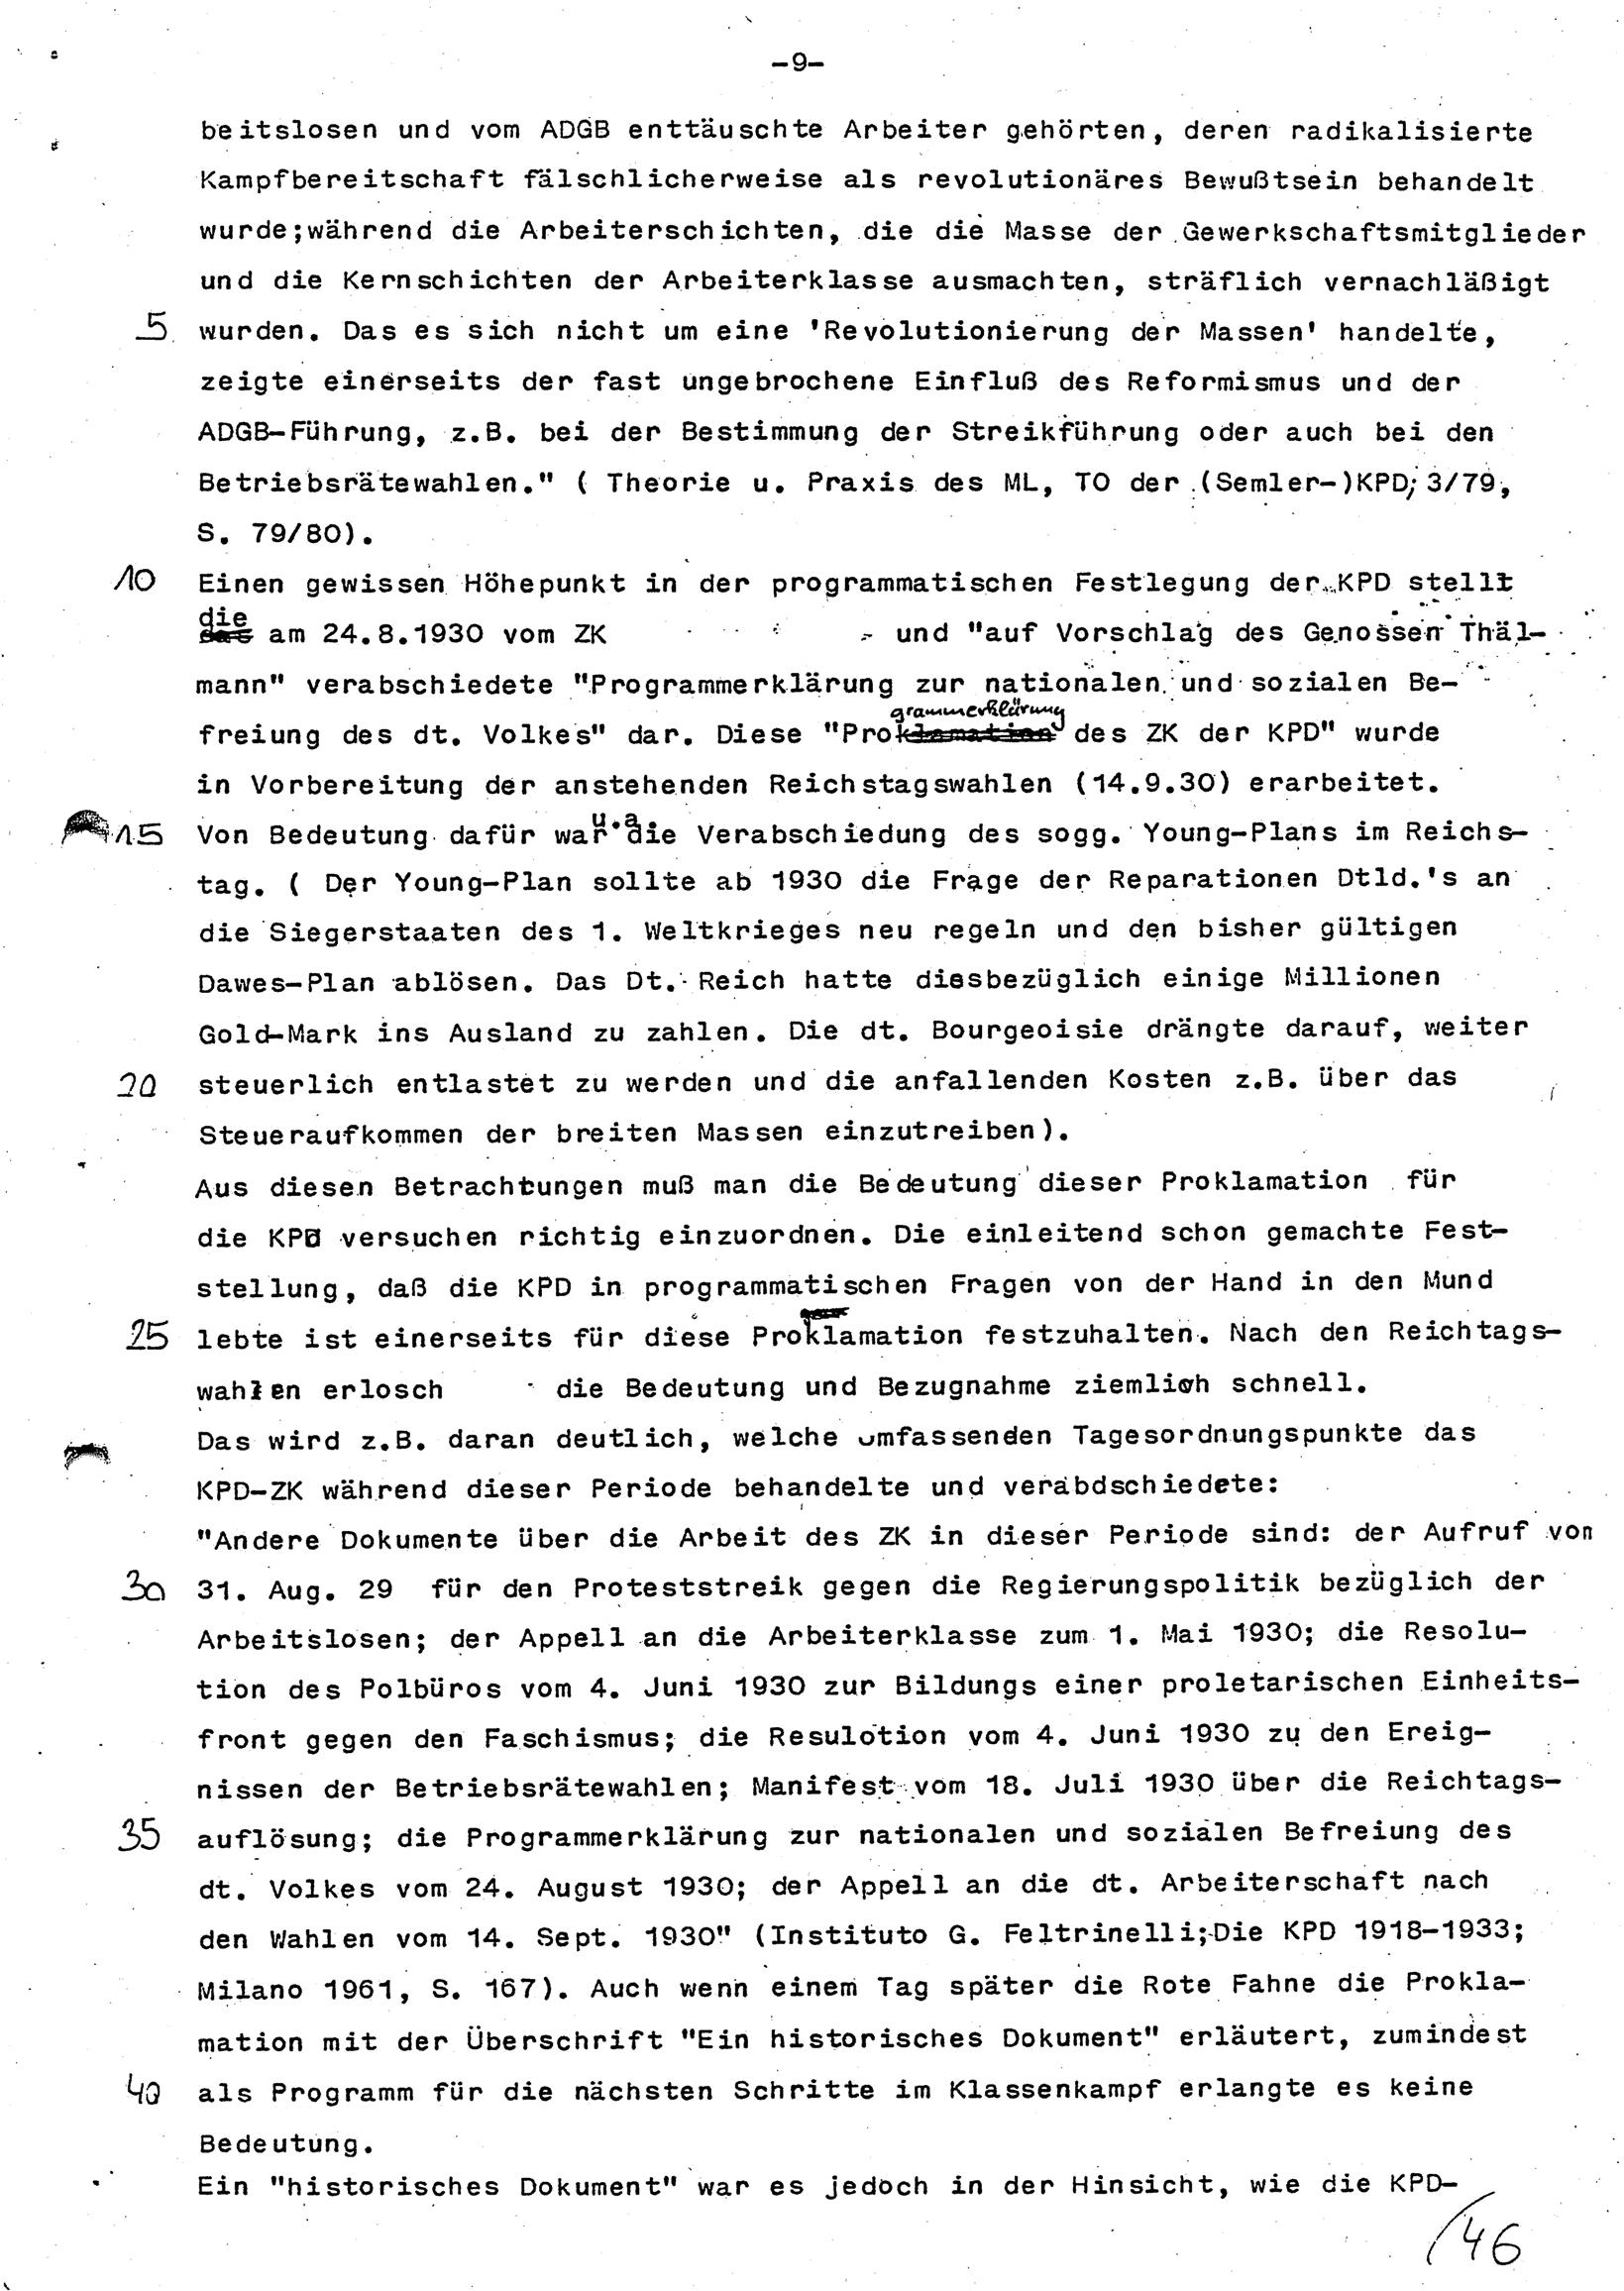 Ulm_KGU_Arbeitsheft_19830425_015_049